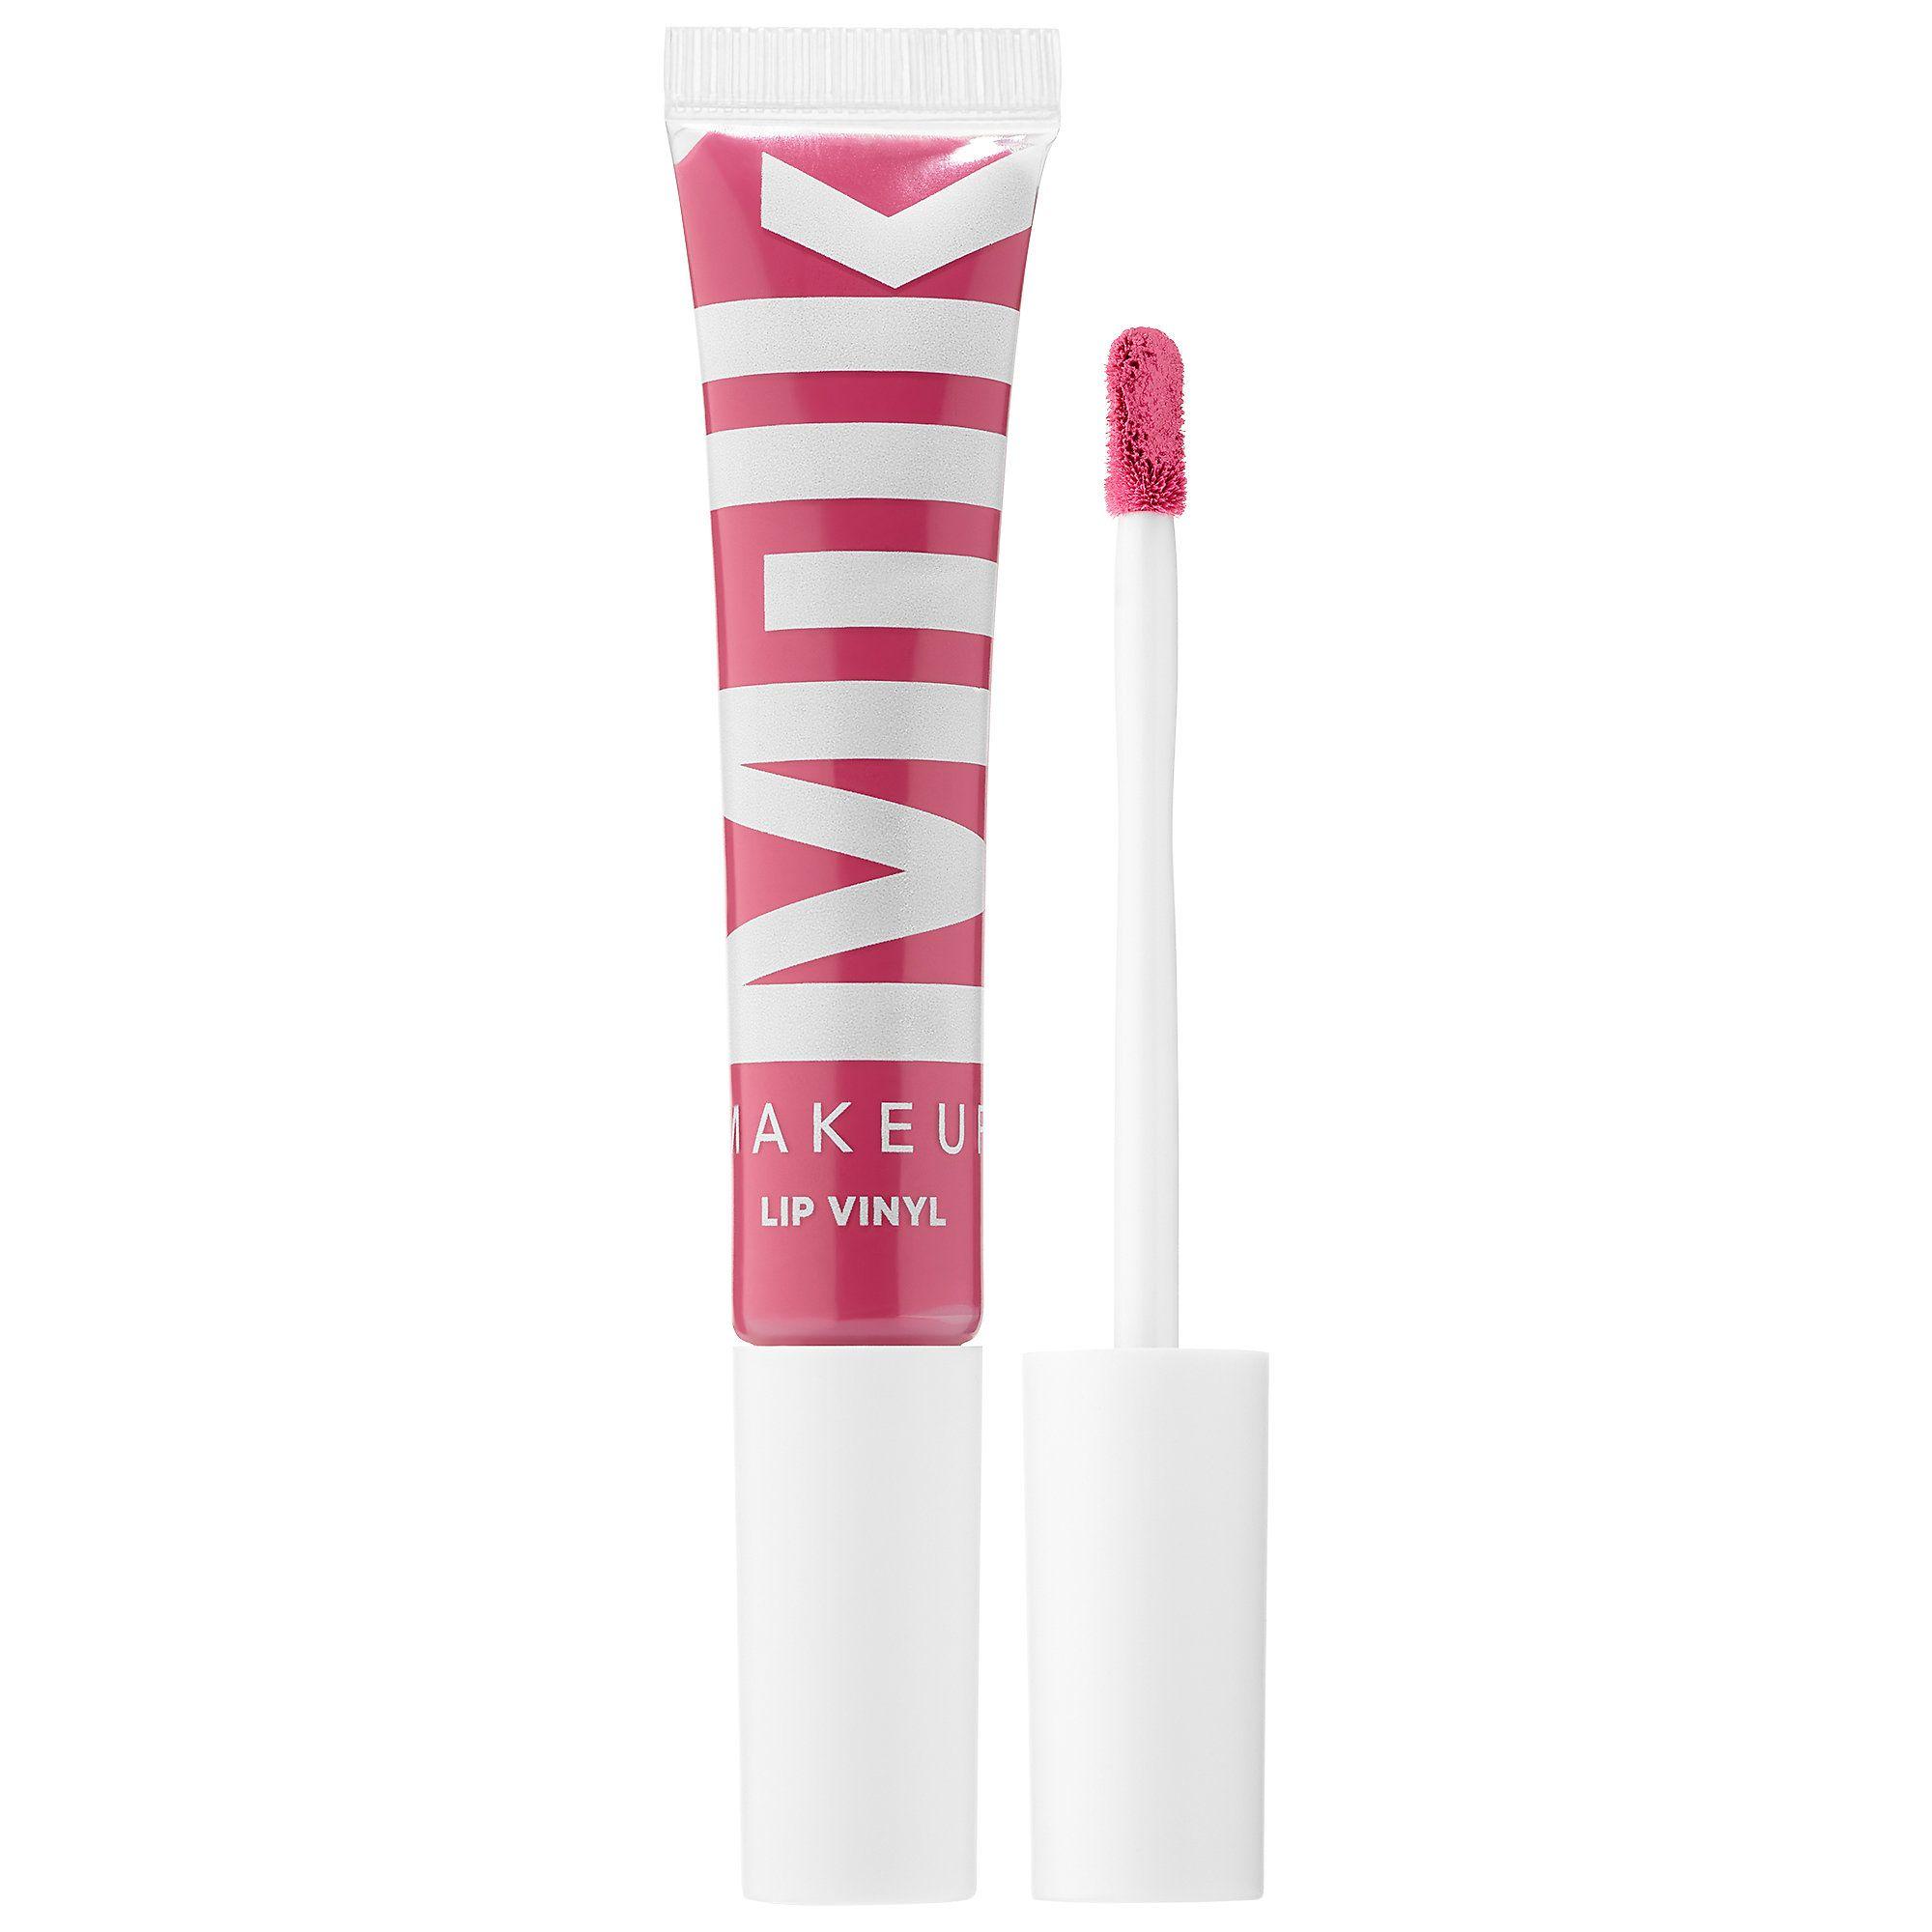 Shop Milk Makeup's Lip Vinyl at Sephora. This full